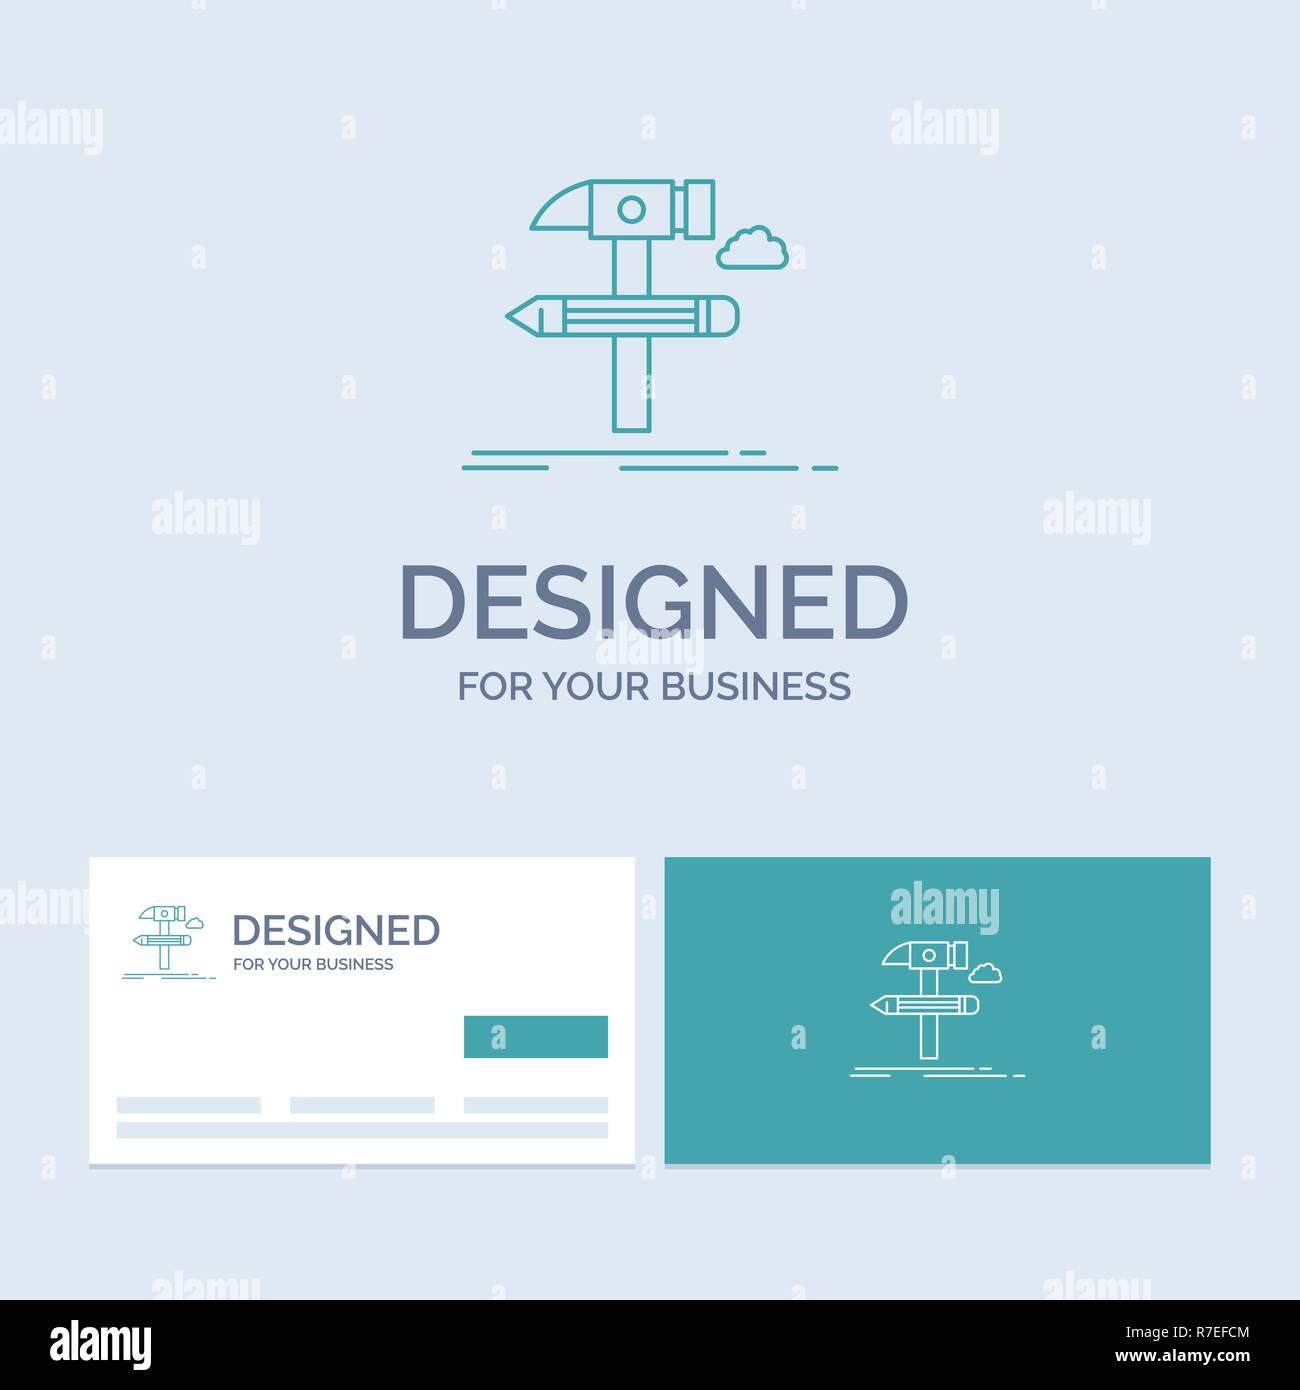 Build Design Develop Tool Tools Business Logo Line Icon Symbol